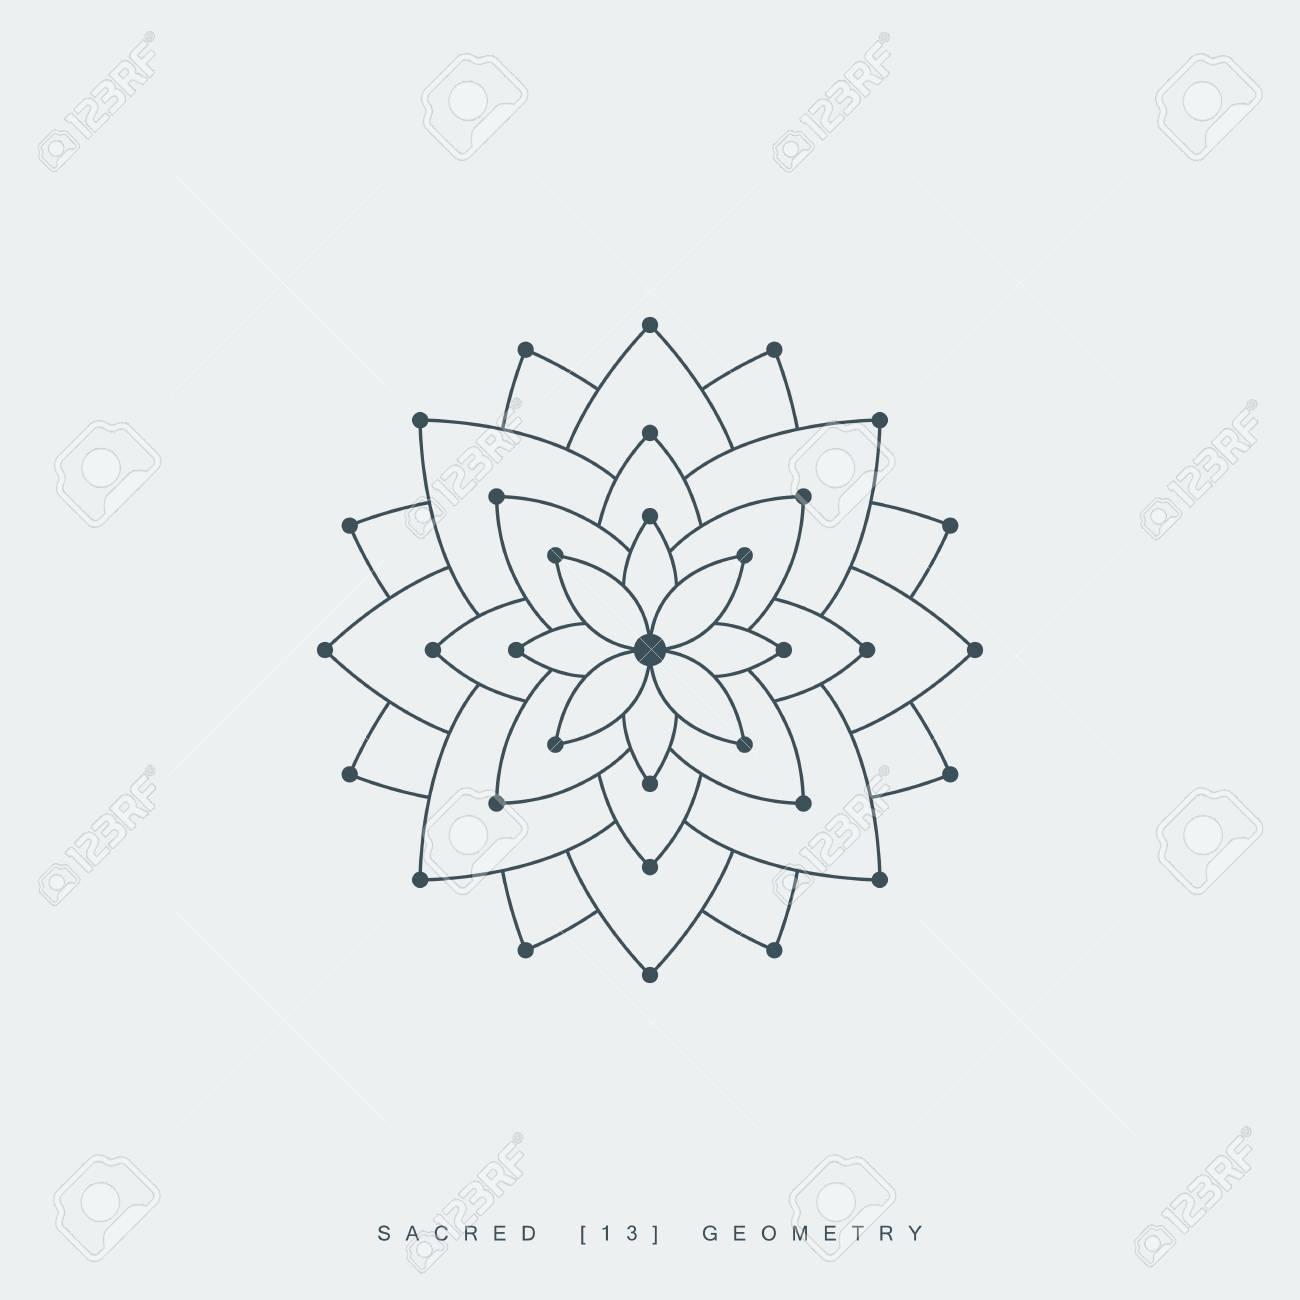 Line lotus flower or flower of life sacred geometry mandala line lotus flower or flower of life sacred geometry mandala ornament esoteric or izmirmasajfo